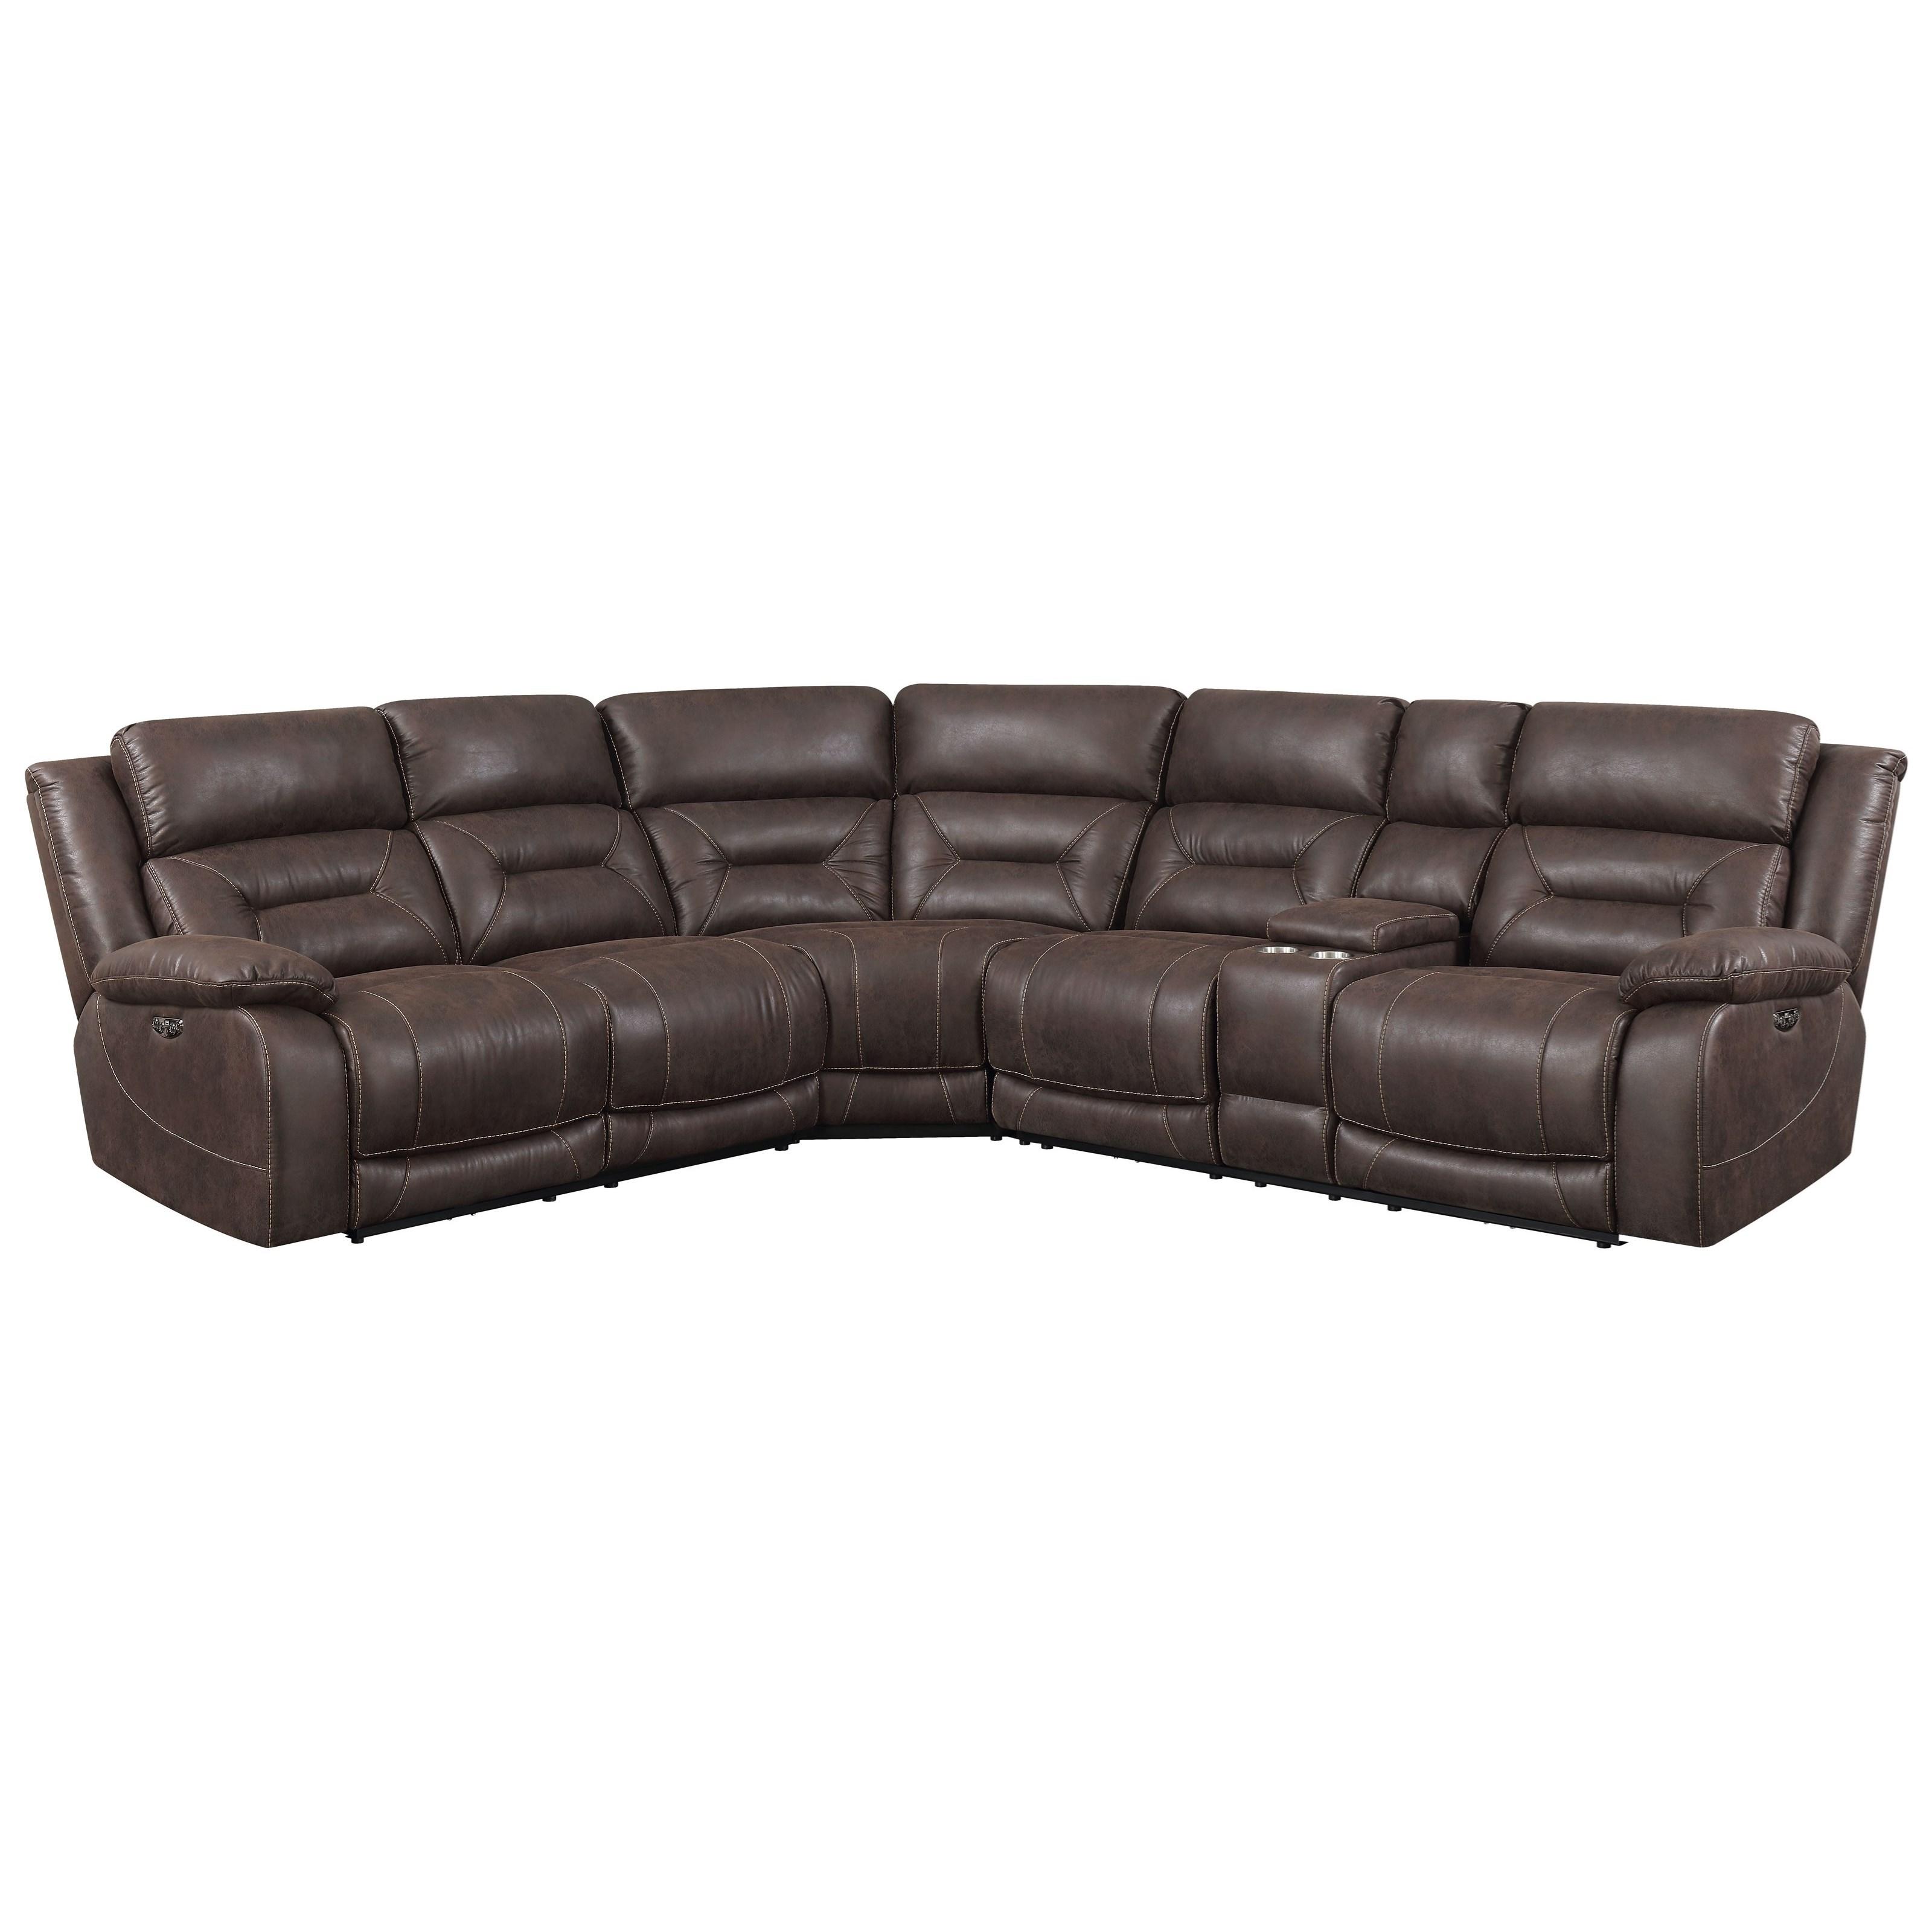 aria 3 piece reclining sectional sofa